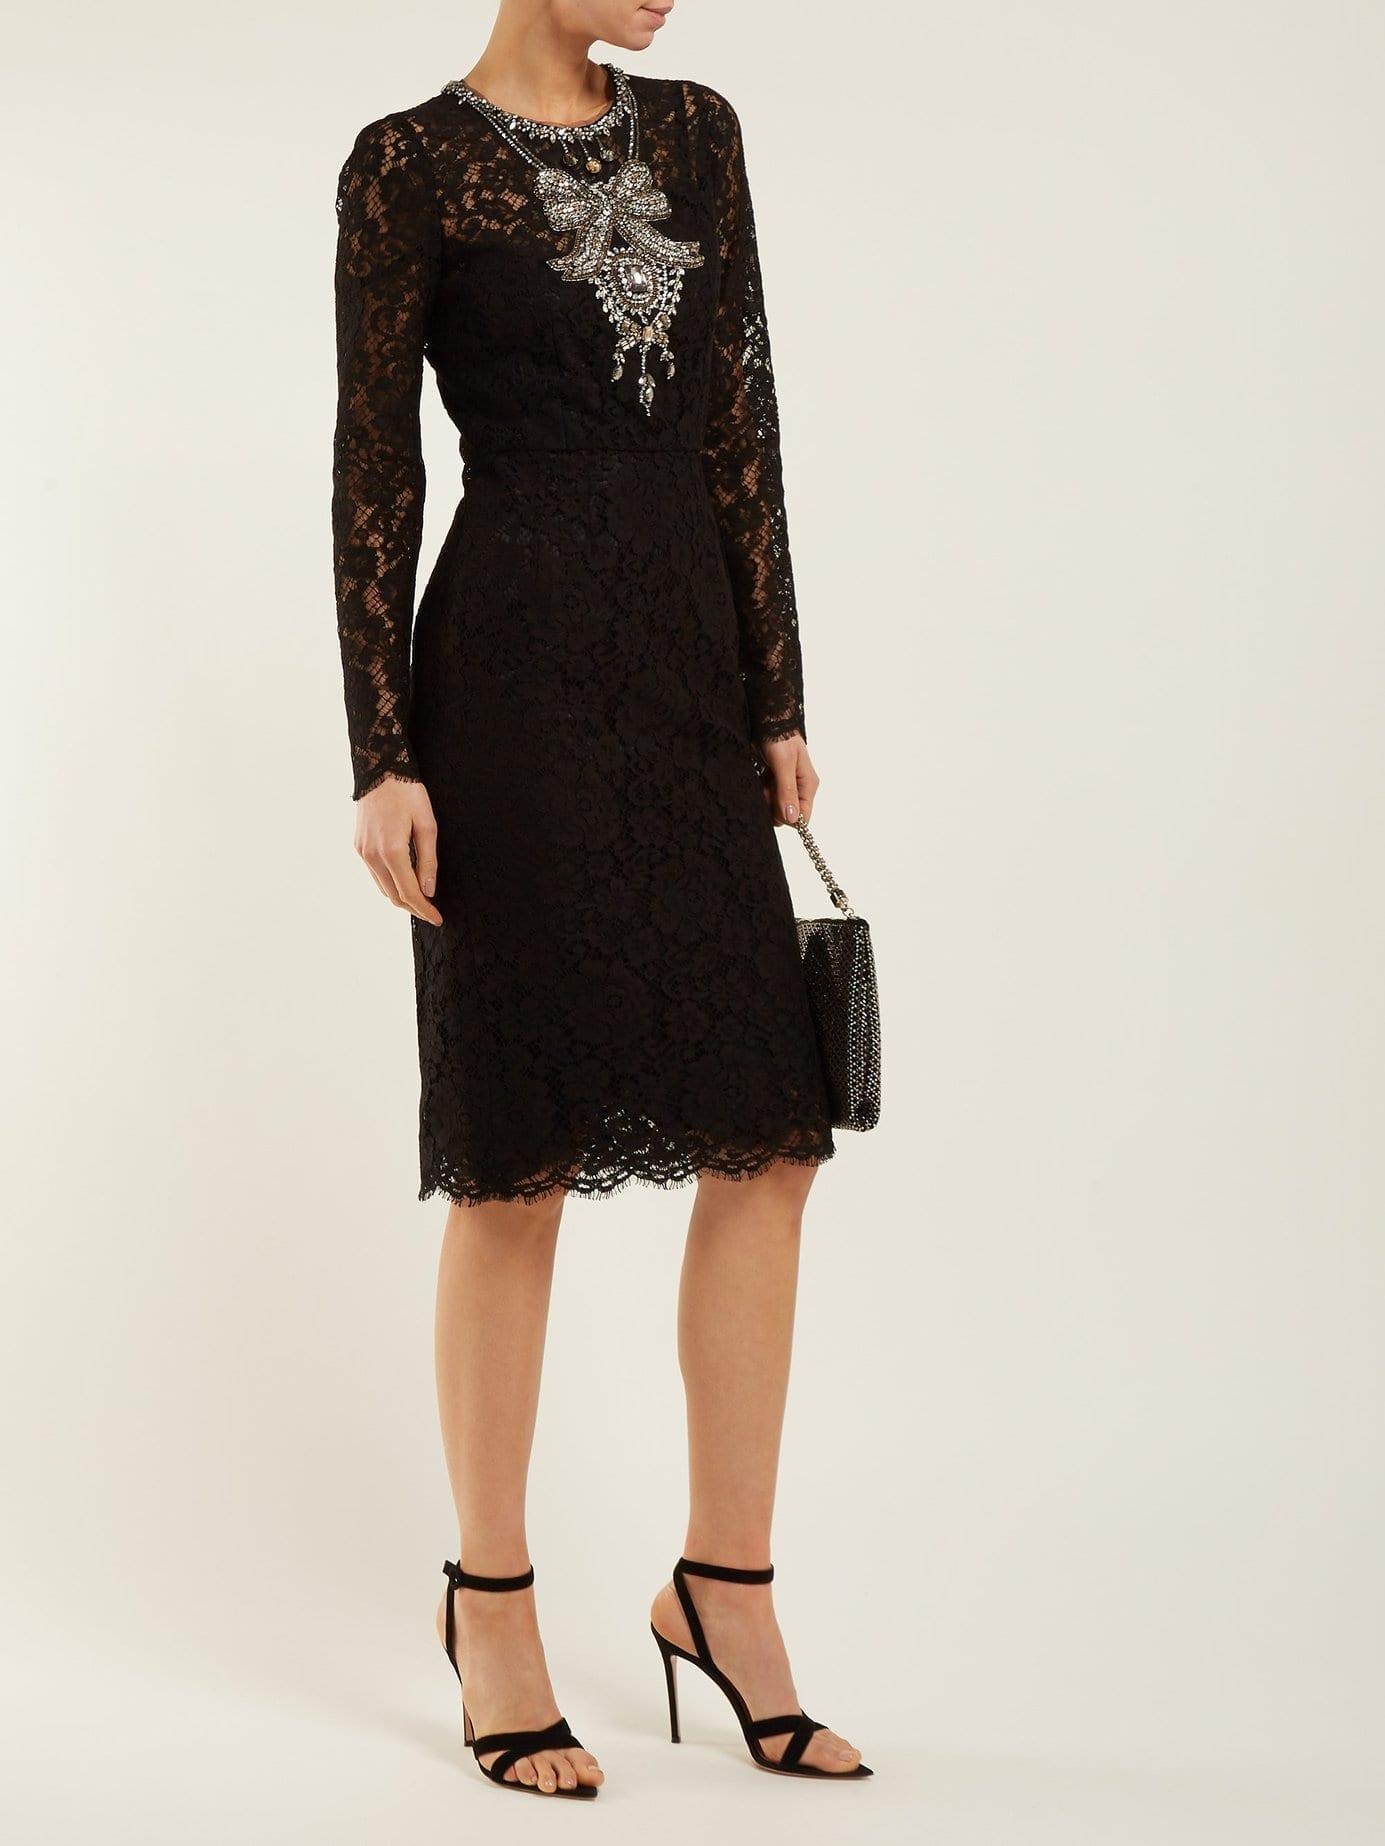 DOLCE & GABBANA Crystal Embellished Guipure Lace Black Dress